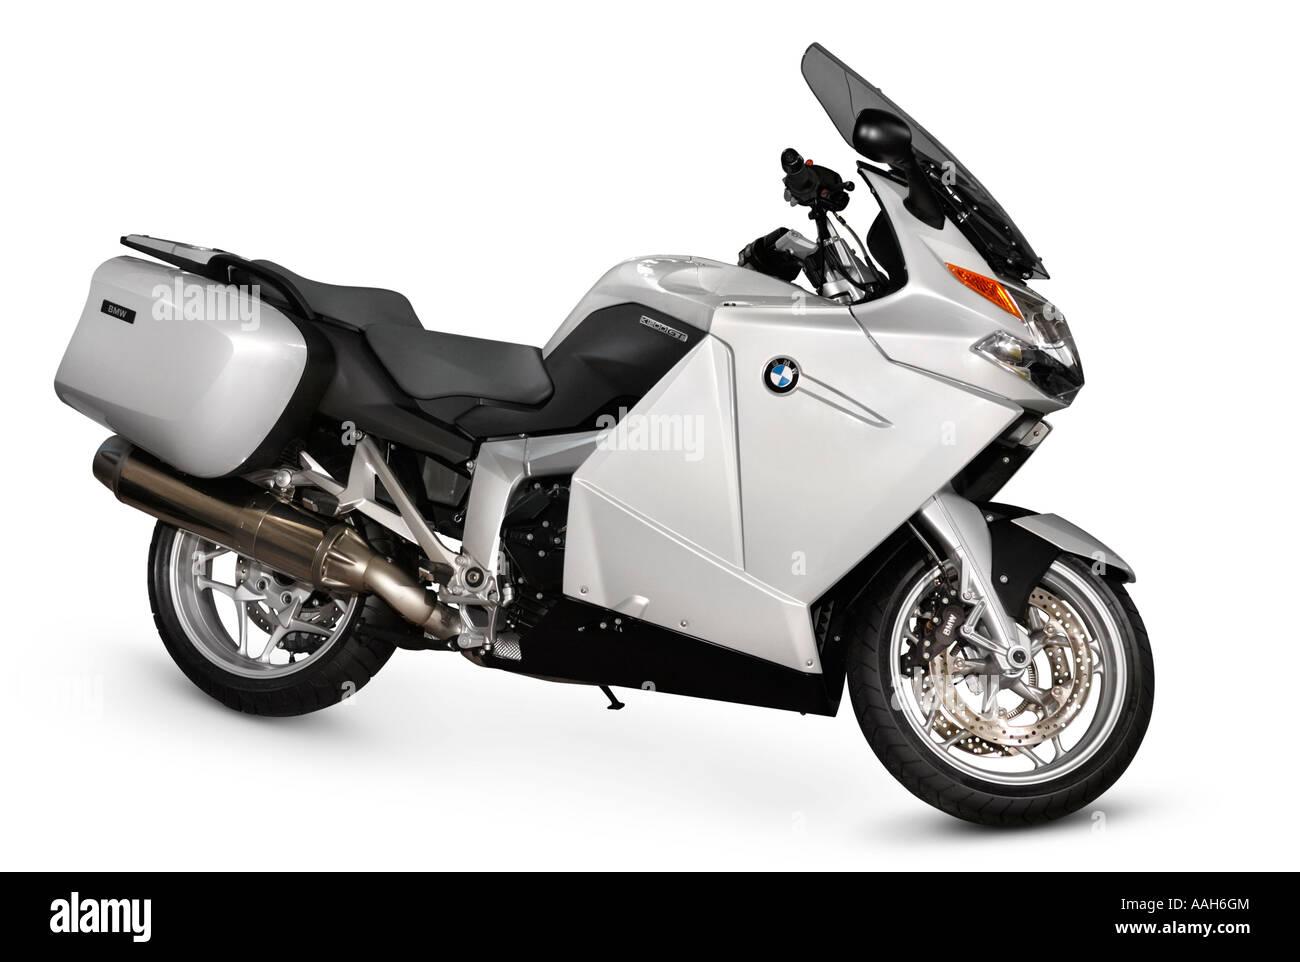 BMW Motorrad K1200 GT motorcycle motorbike Super bike  Isolated on white cutout - Stock Image